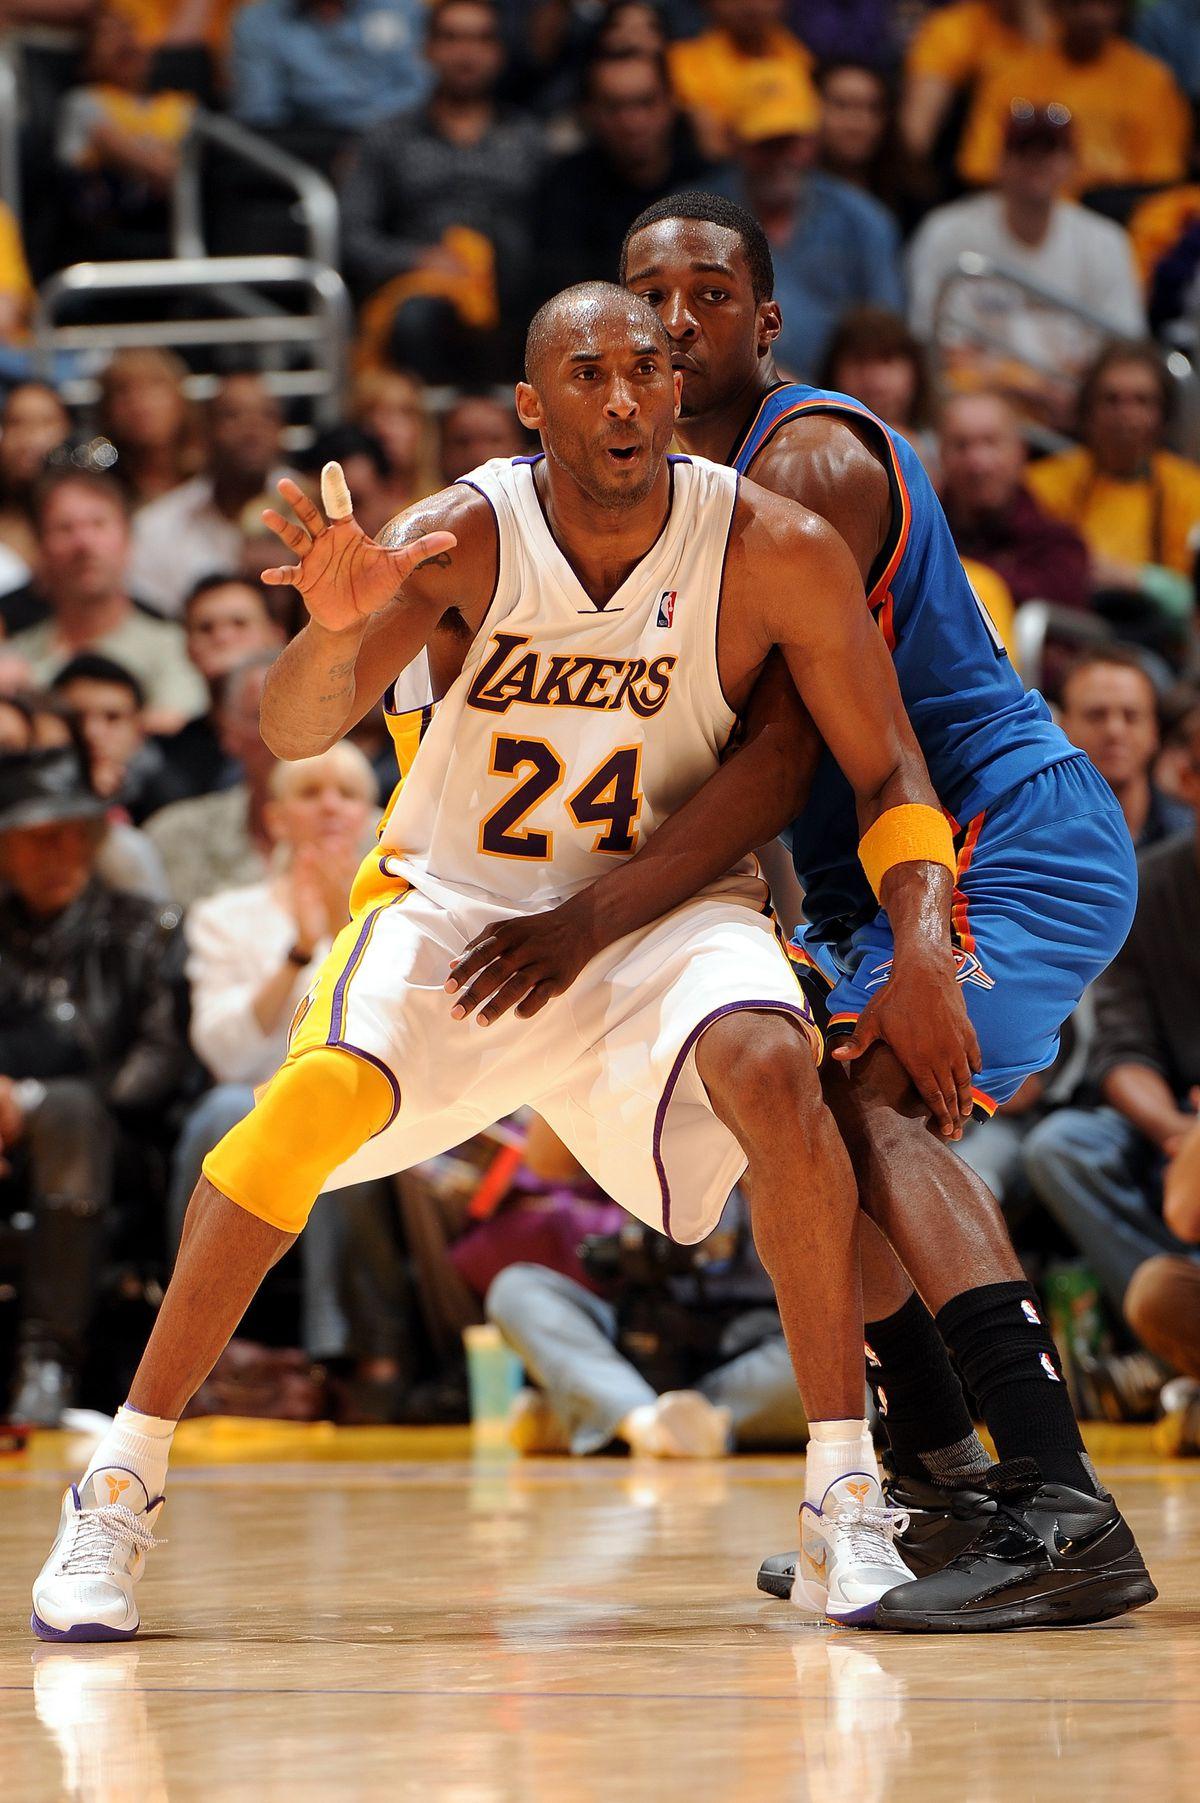 Oklahoma City Thunder v Los Angeles Lakers, Game 1